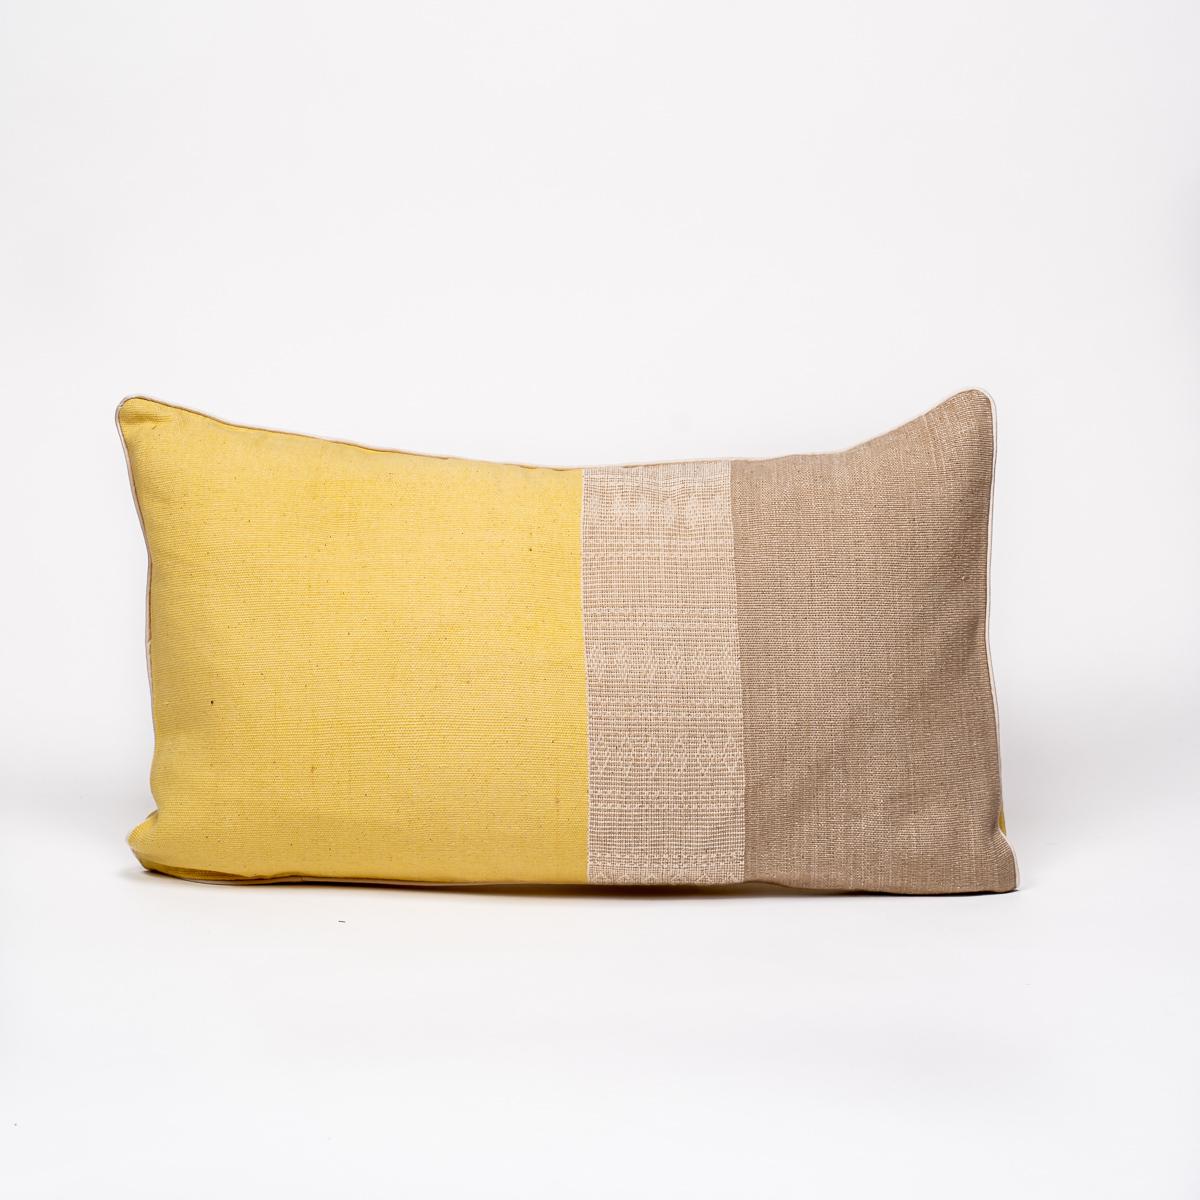 Coussin Walang jaune